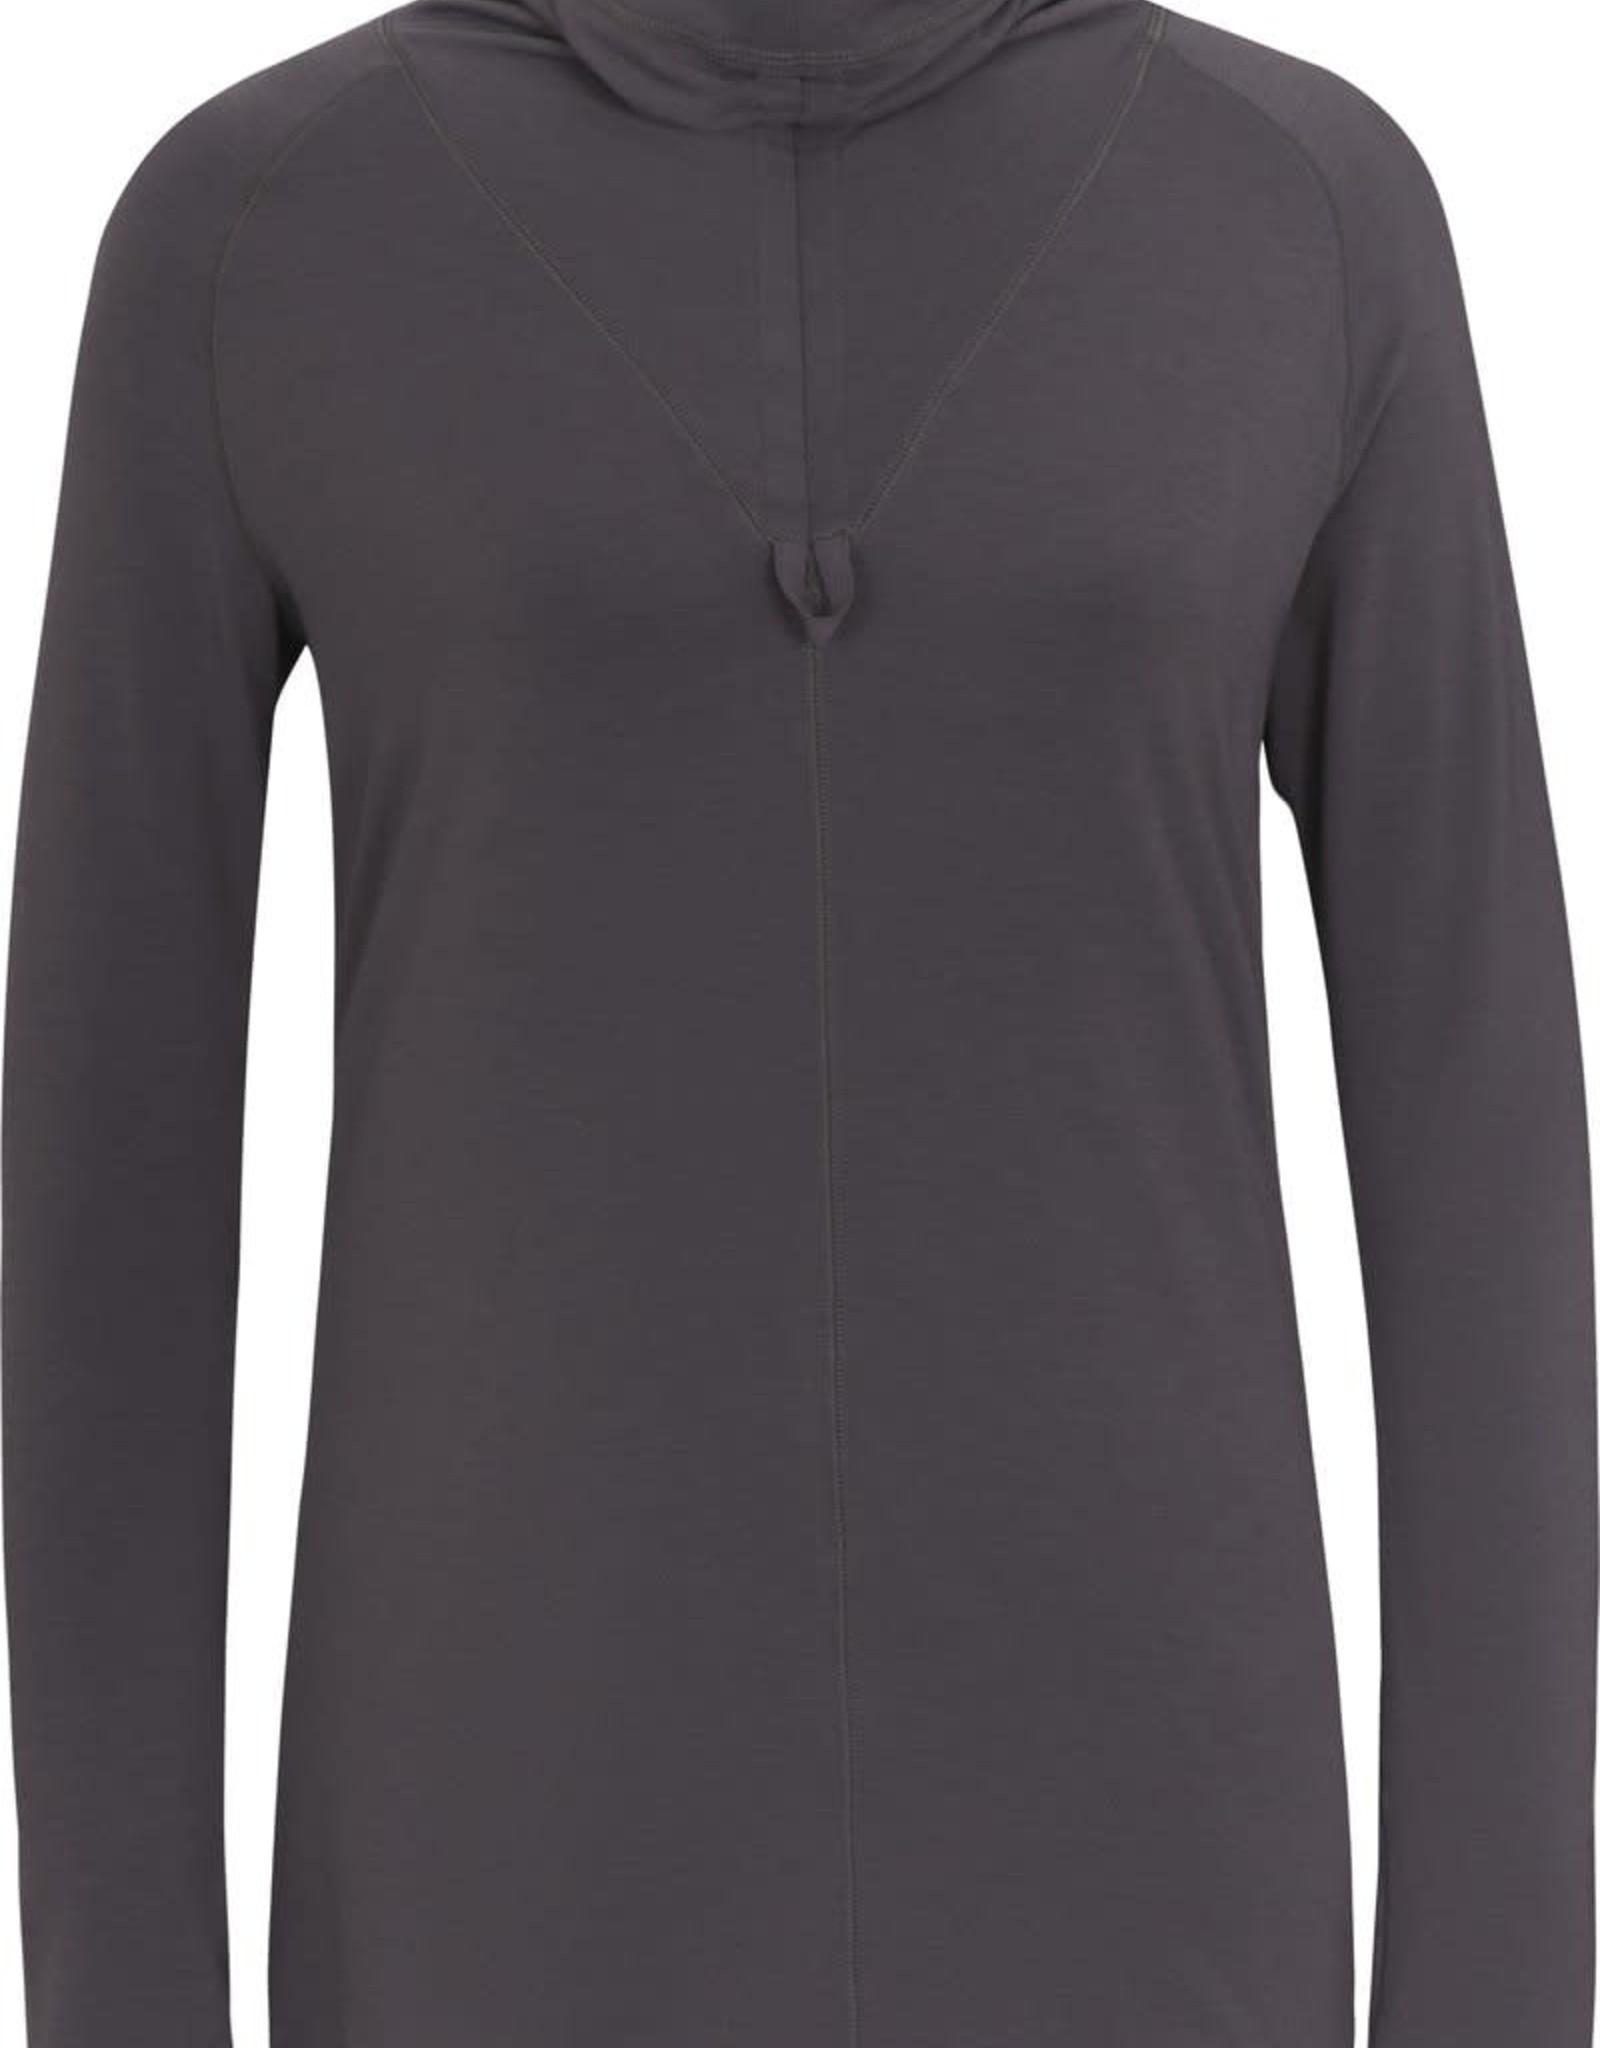 Indygena Rolka sweater